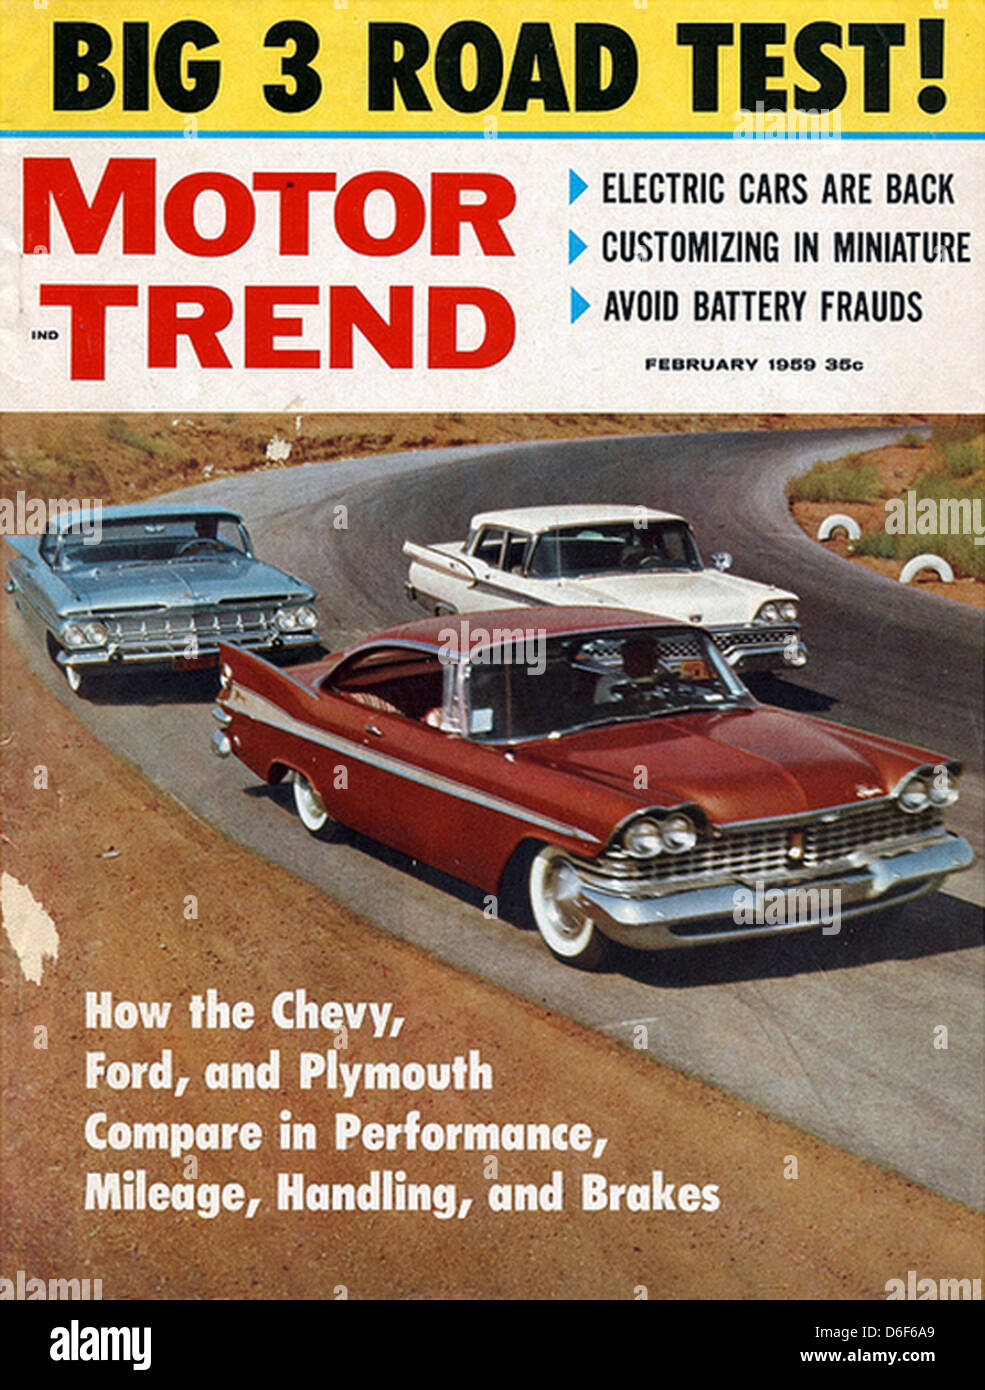 MOTOR TREND U.S. Auto Magazin Ausgabe Februar 1959 Stockbild